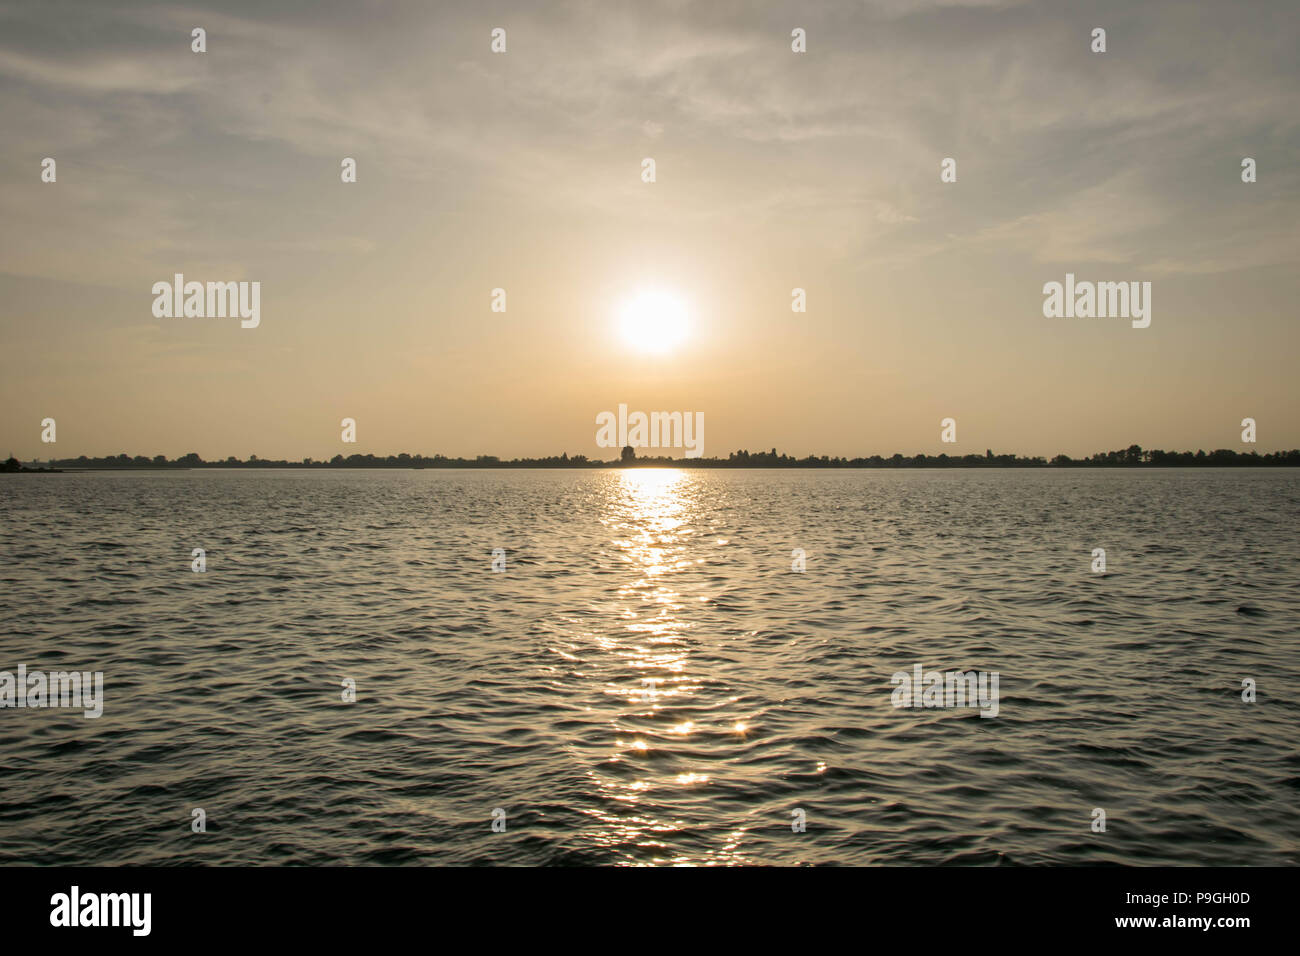 Europe, Italy, Veneto, Venice. Picturesque sunset over Lagune di Venezia (Venice Lagoon) seen from vaporetto (water tram) heading Punta Sabbioni. - Stock Image